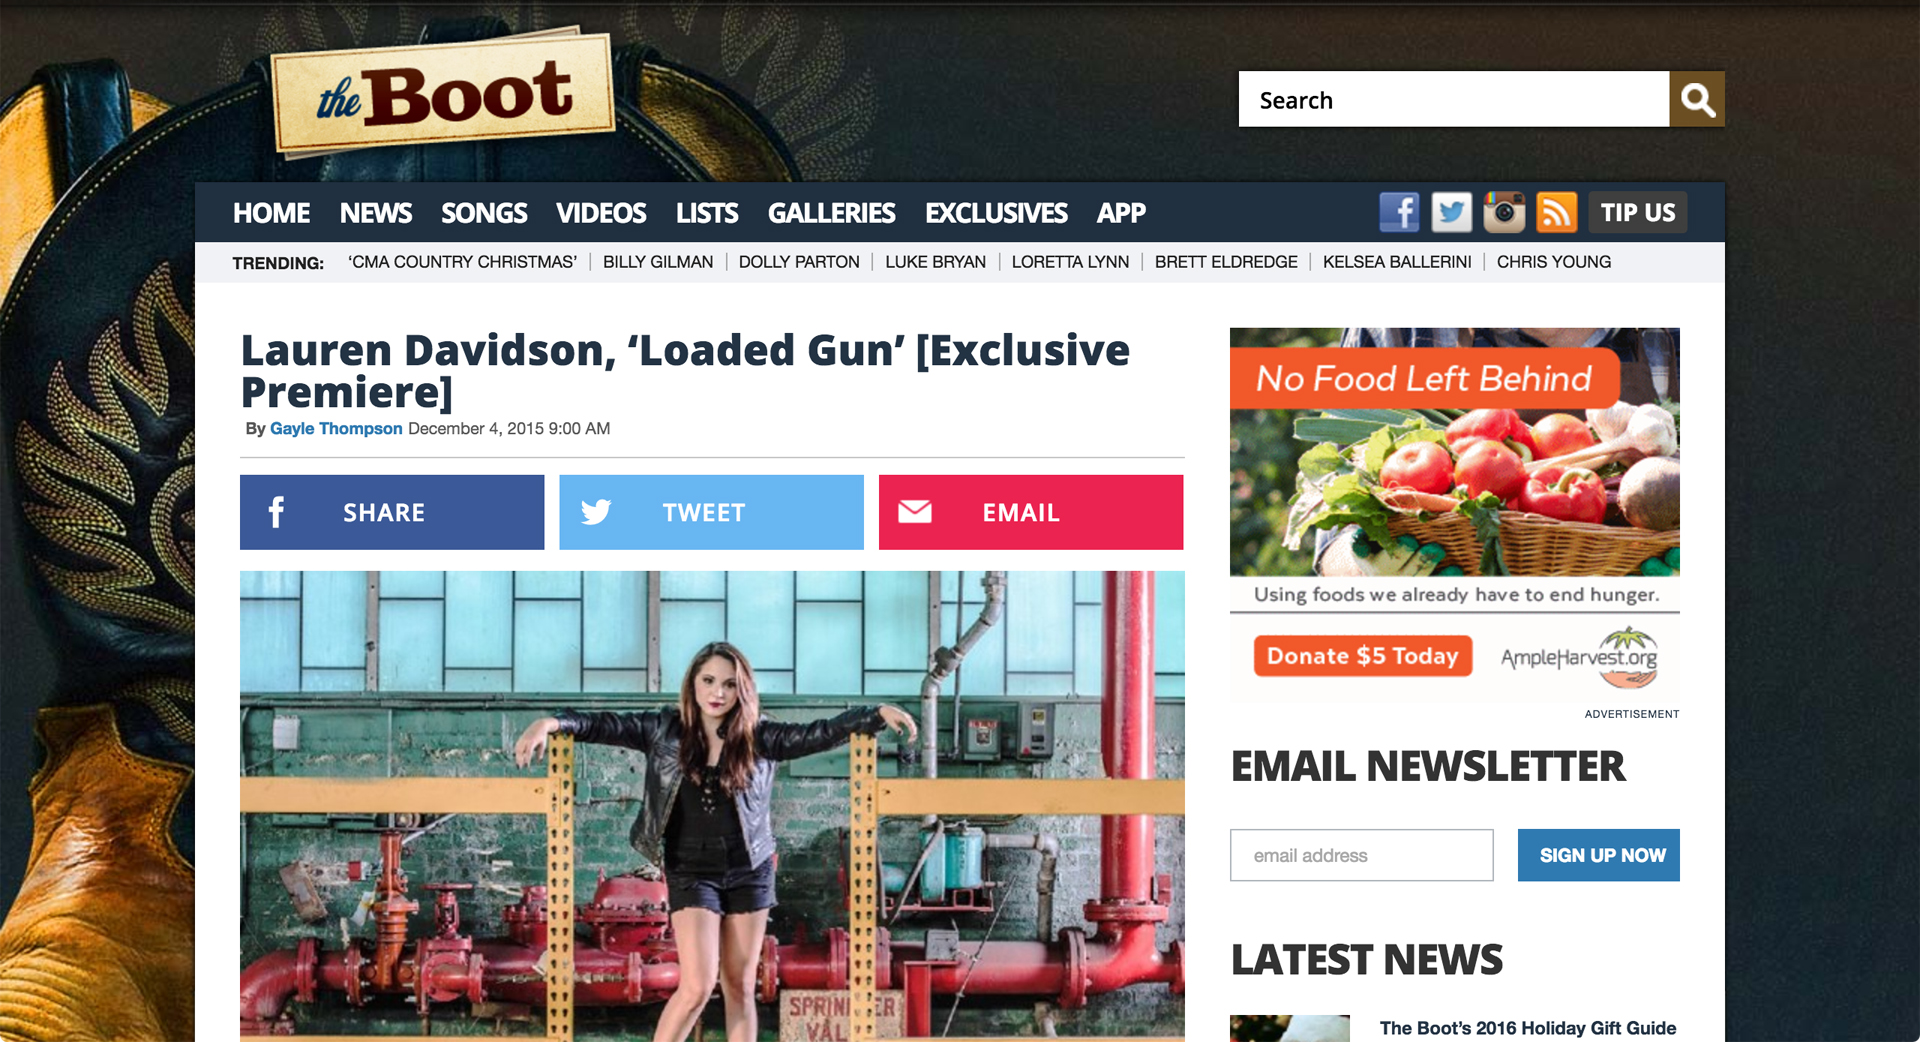 http://theboot.com/lauren-davidson-loaded-gun/